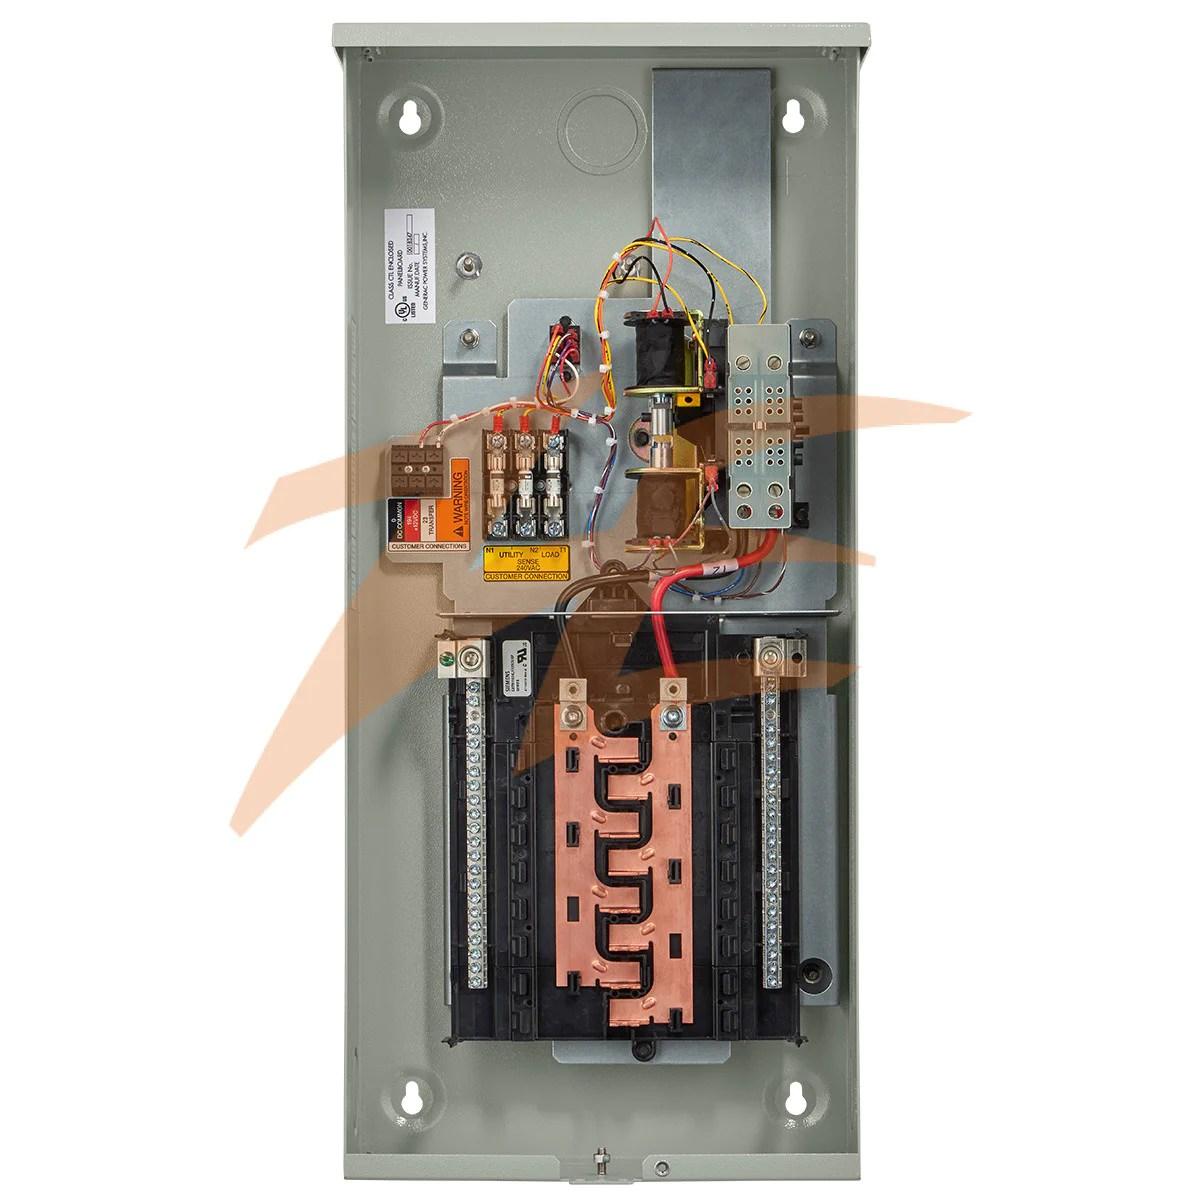 hight resolution of  amp generac transfer switch wiring diagram on generac xp8000e wiring diagram generac nexus controller wiring